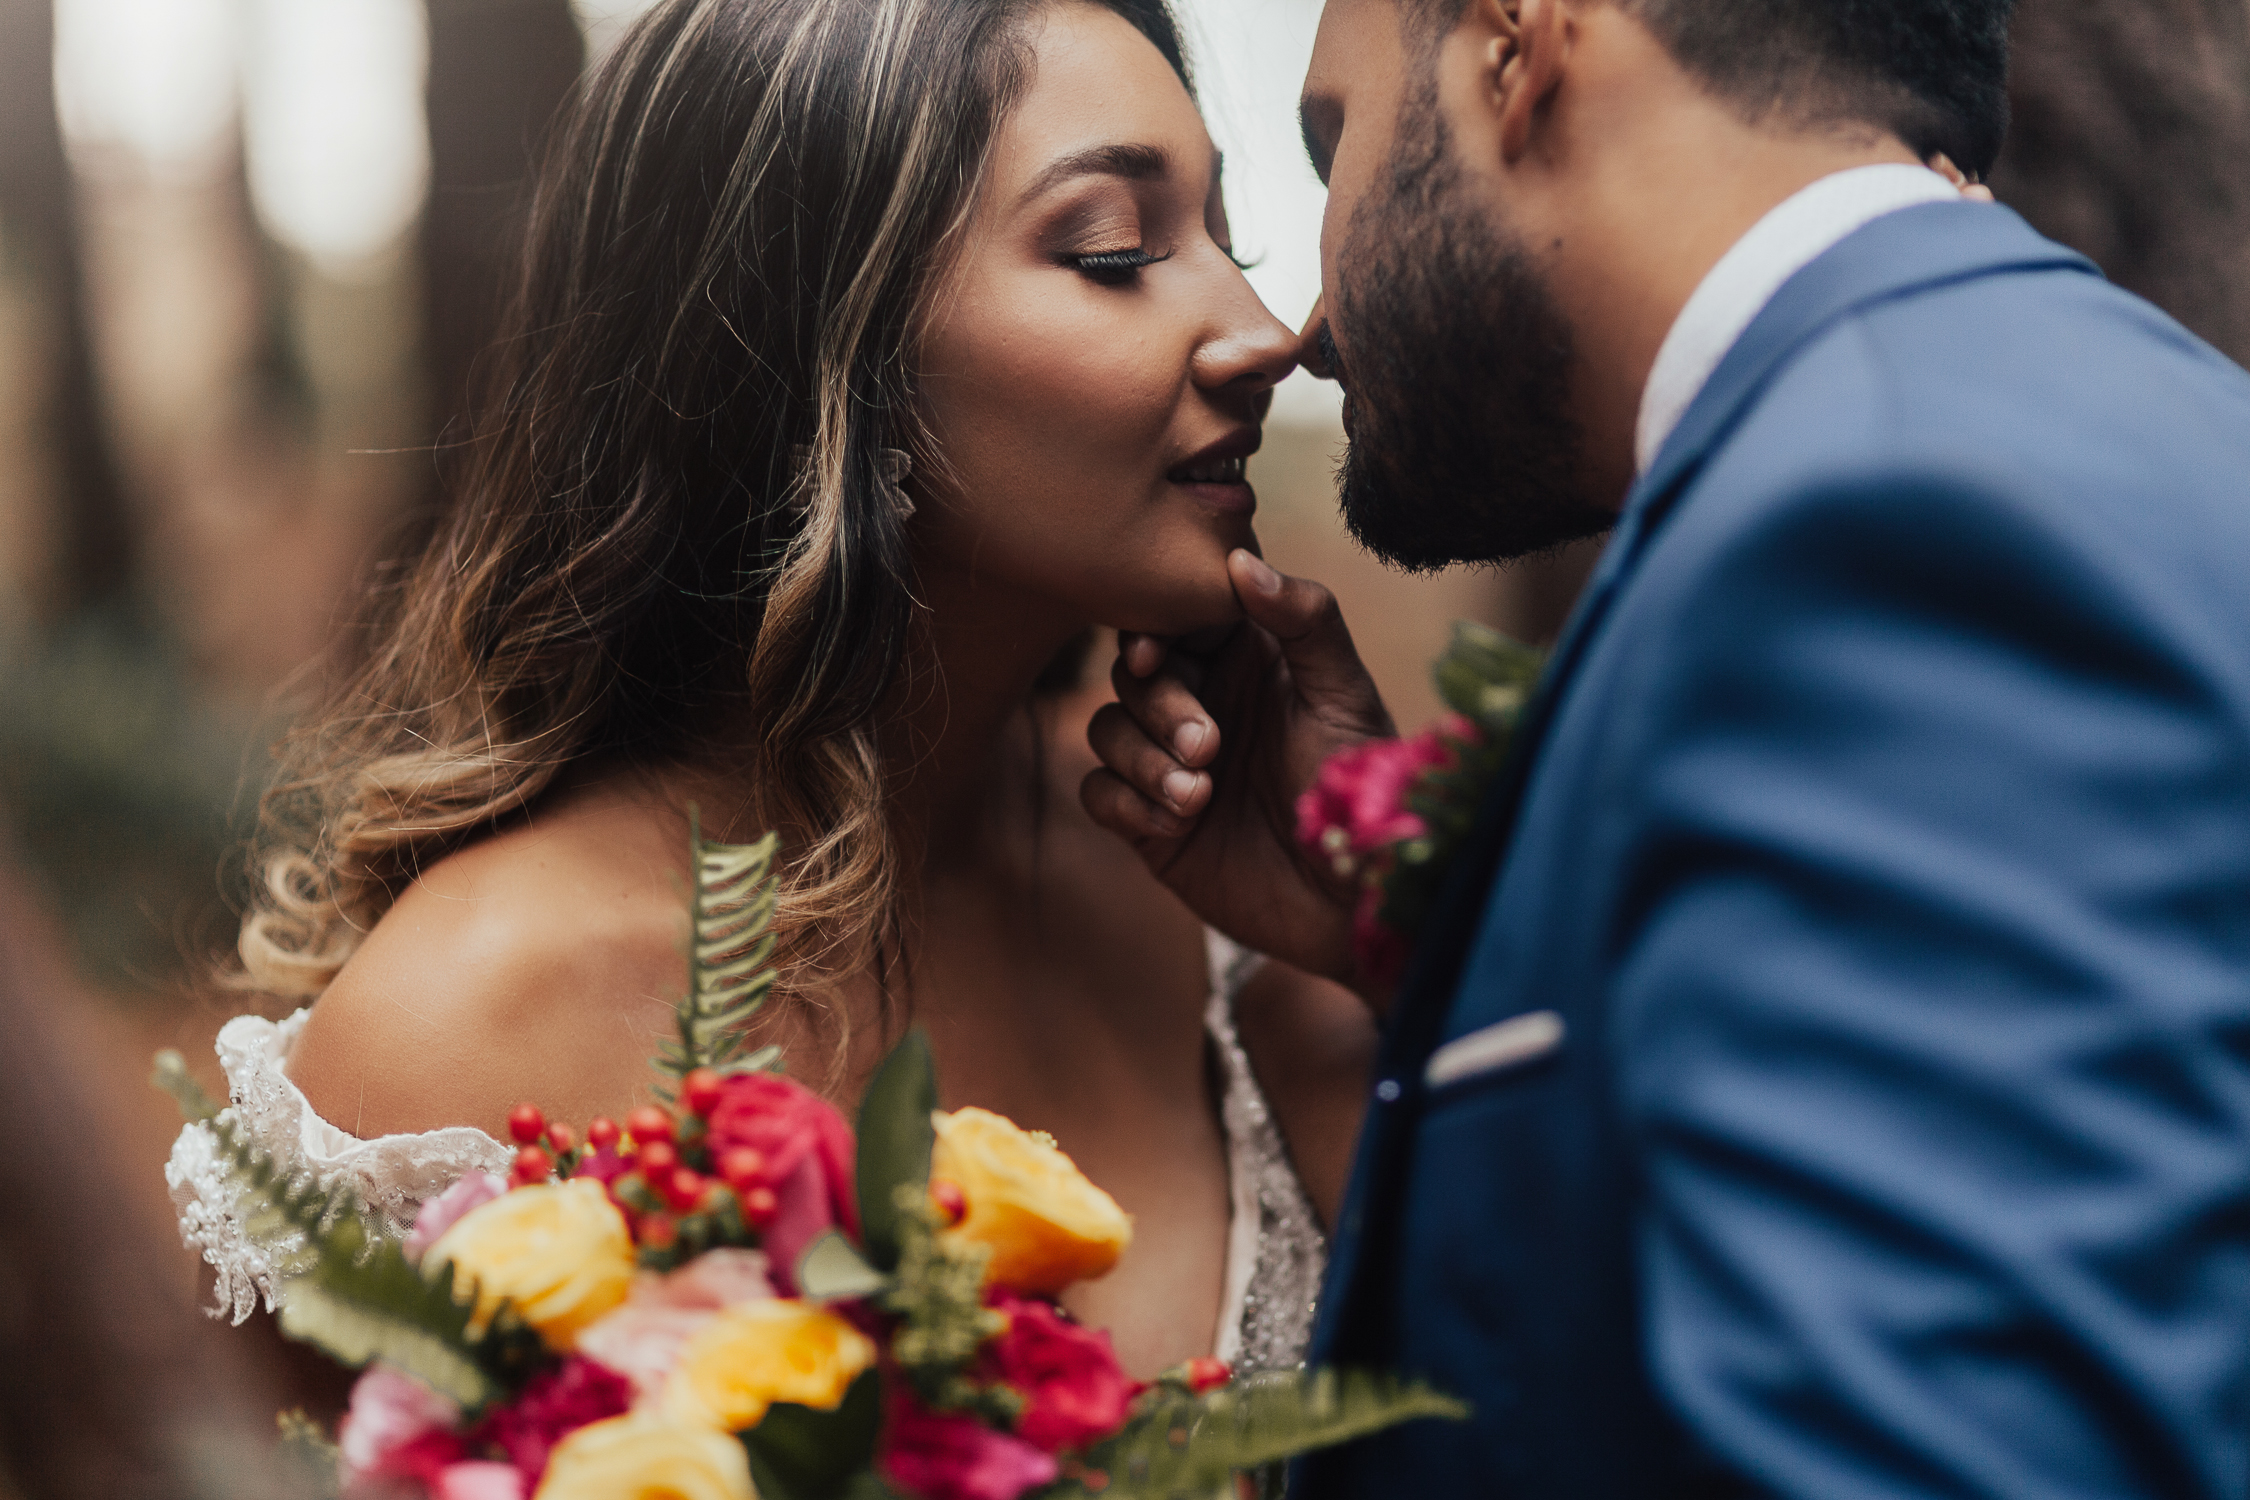 Michelle-Agurto-Fotografia-Bodas-Destination-Wedding-Photographer-Ecuador-Sesion-Johanna-Eduardo-2.JPG